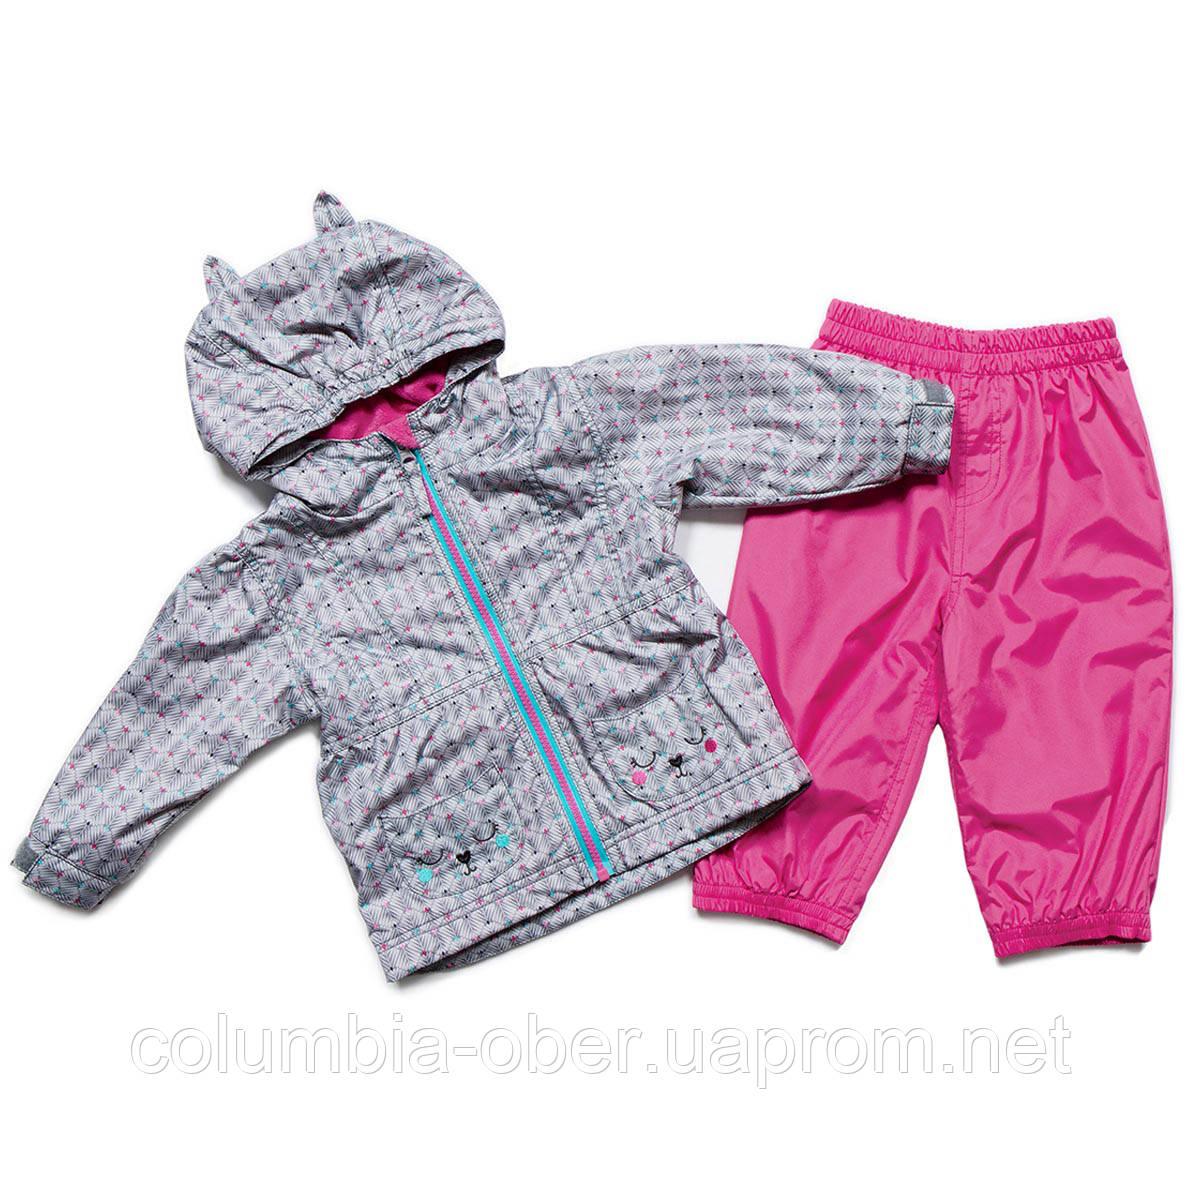 Демисезонный костюм для девочки Peluche S18 M 08 BF Frost Gray. Размер 74-100.